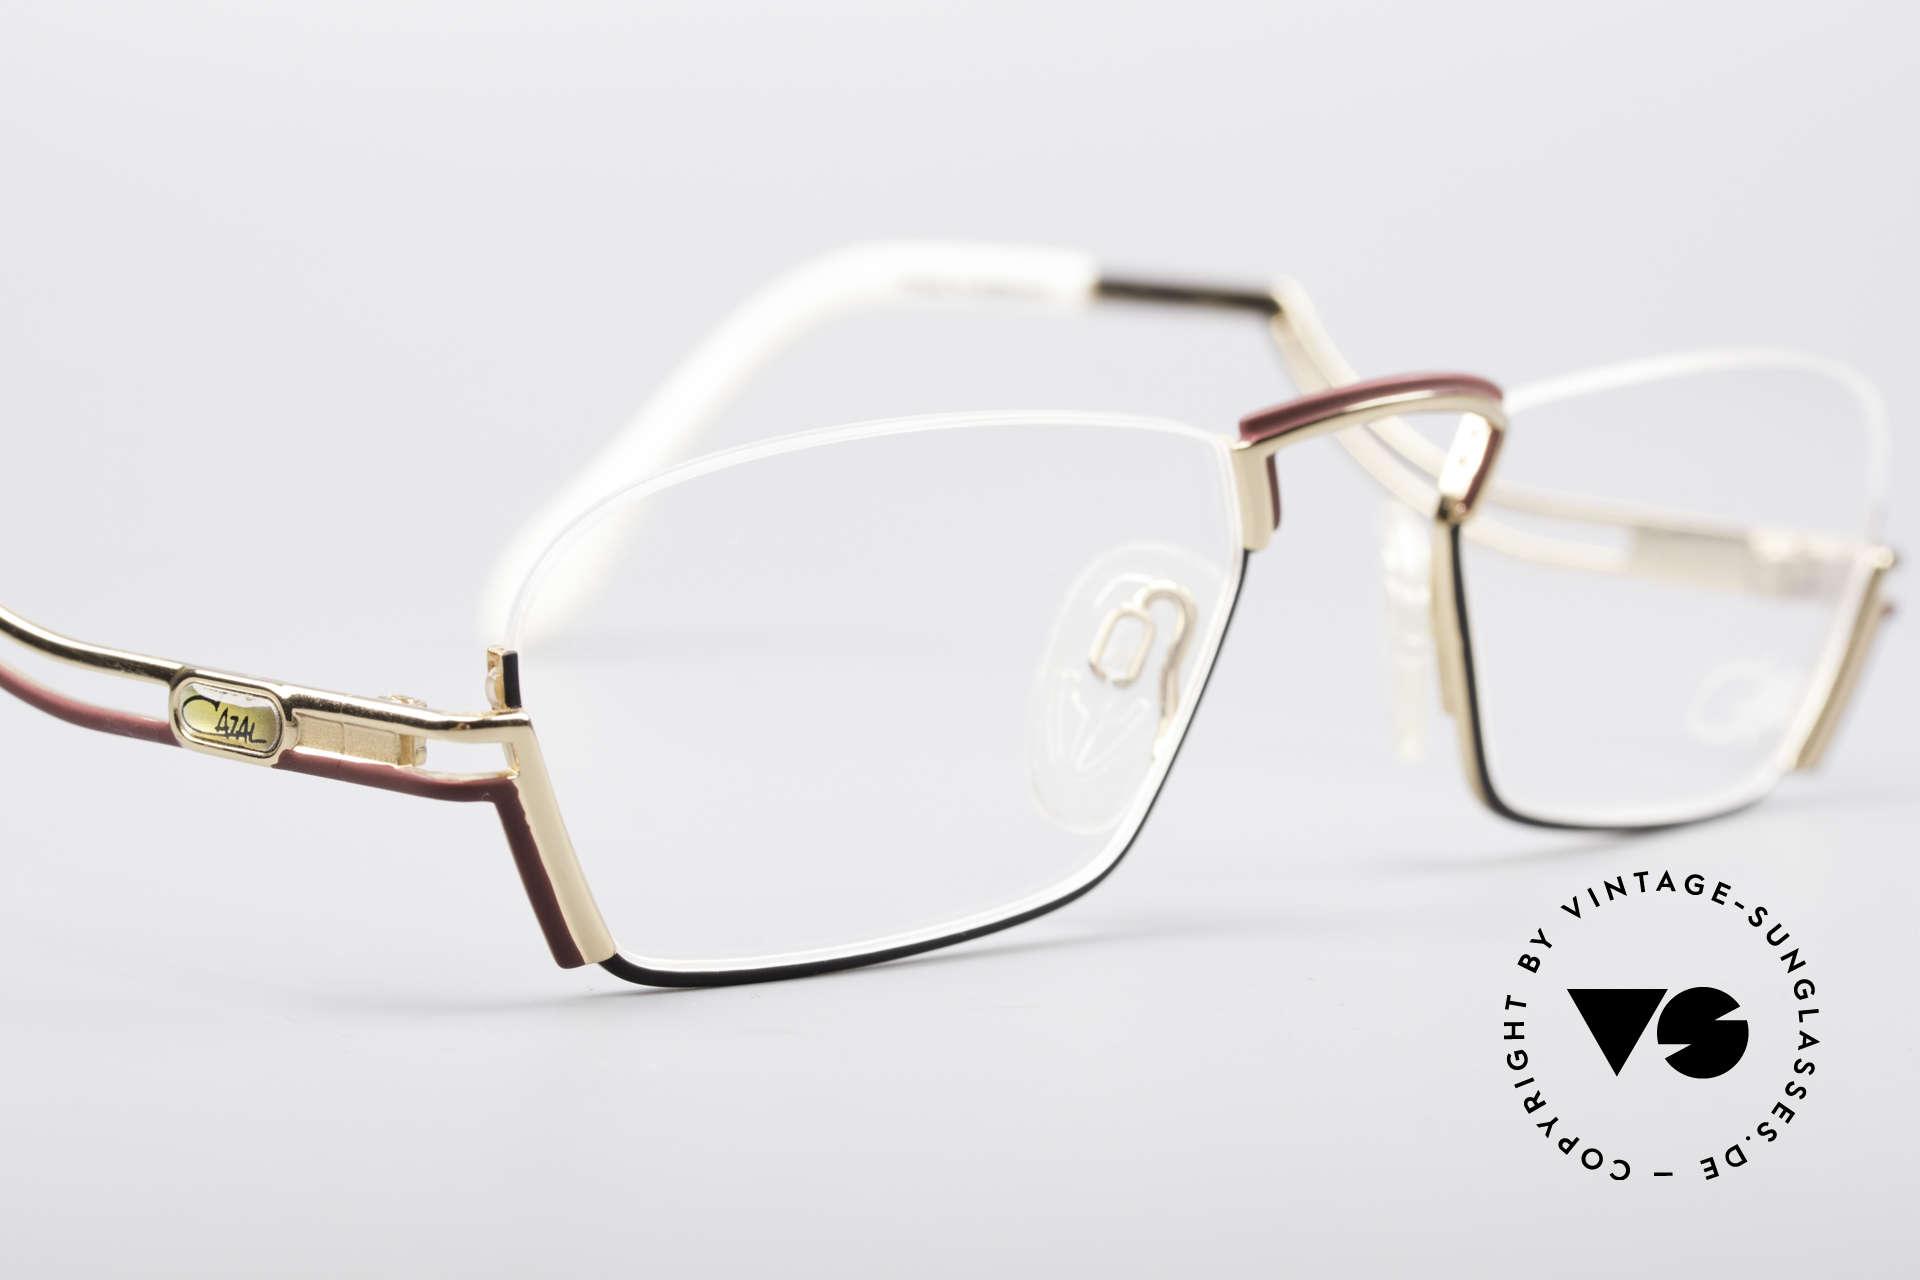 Cazal 232 Vintage Reading Eyeglasses, Size: medium, Made for Men and Women